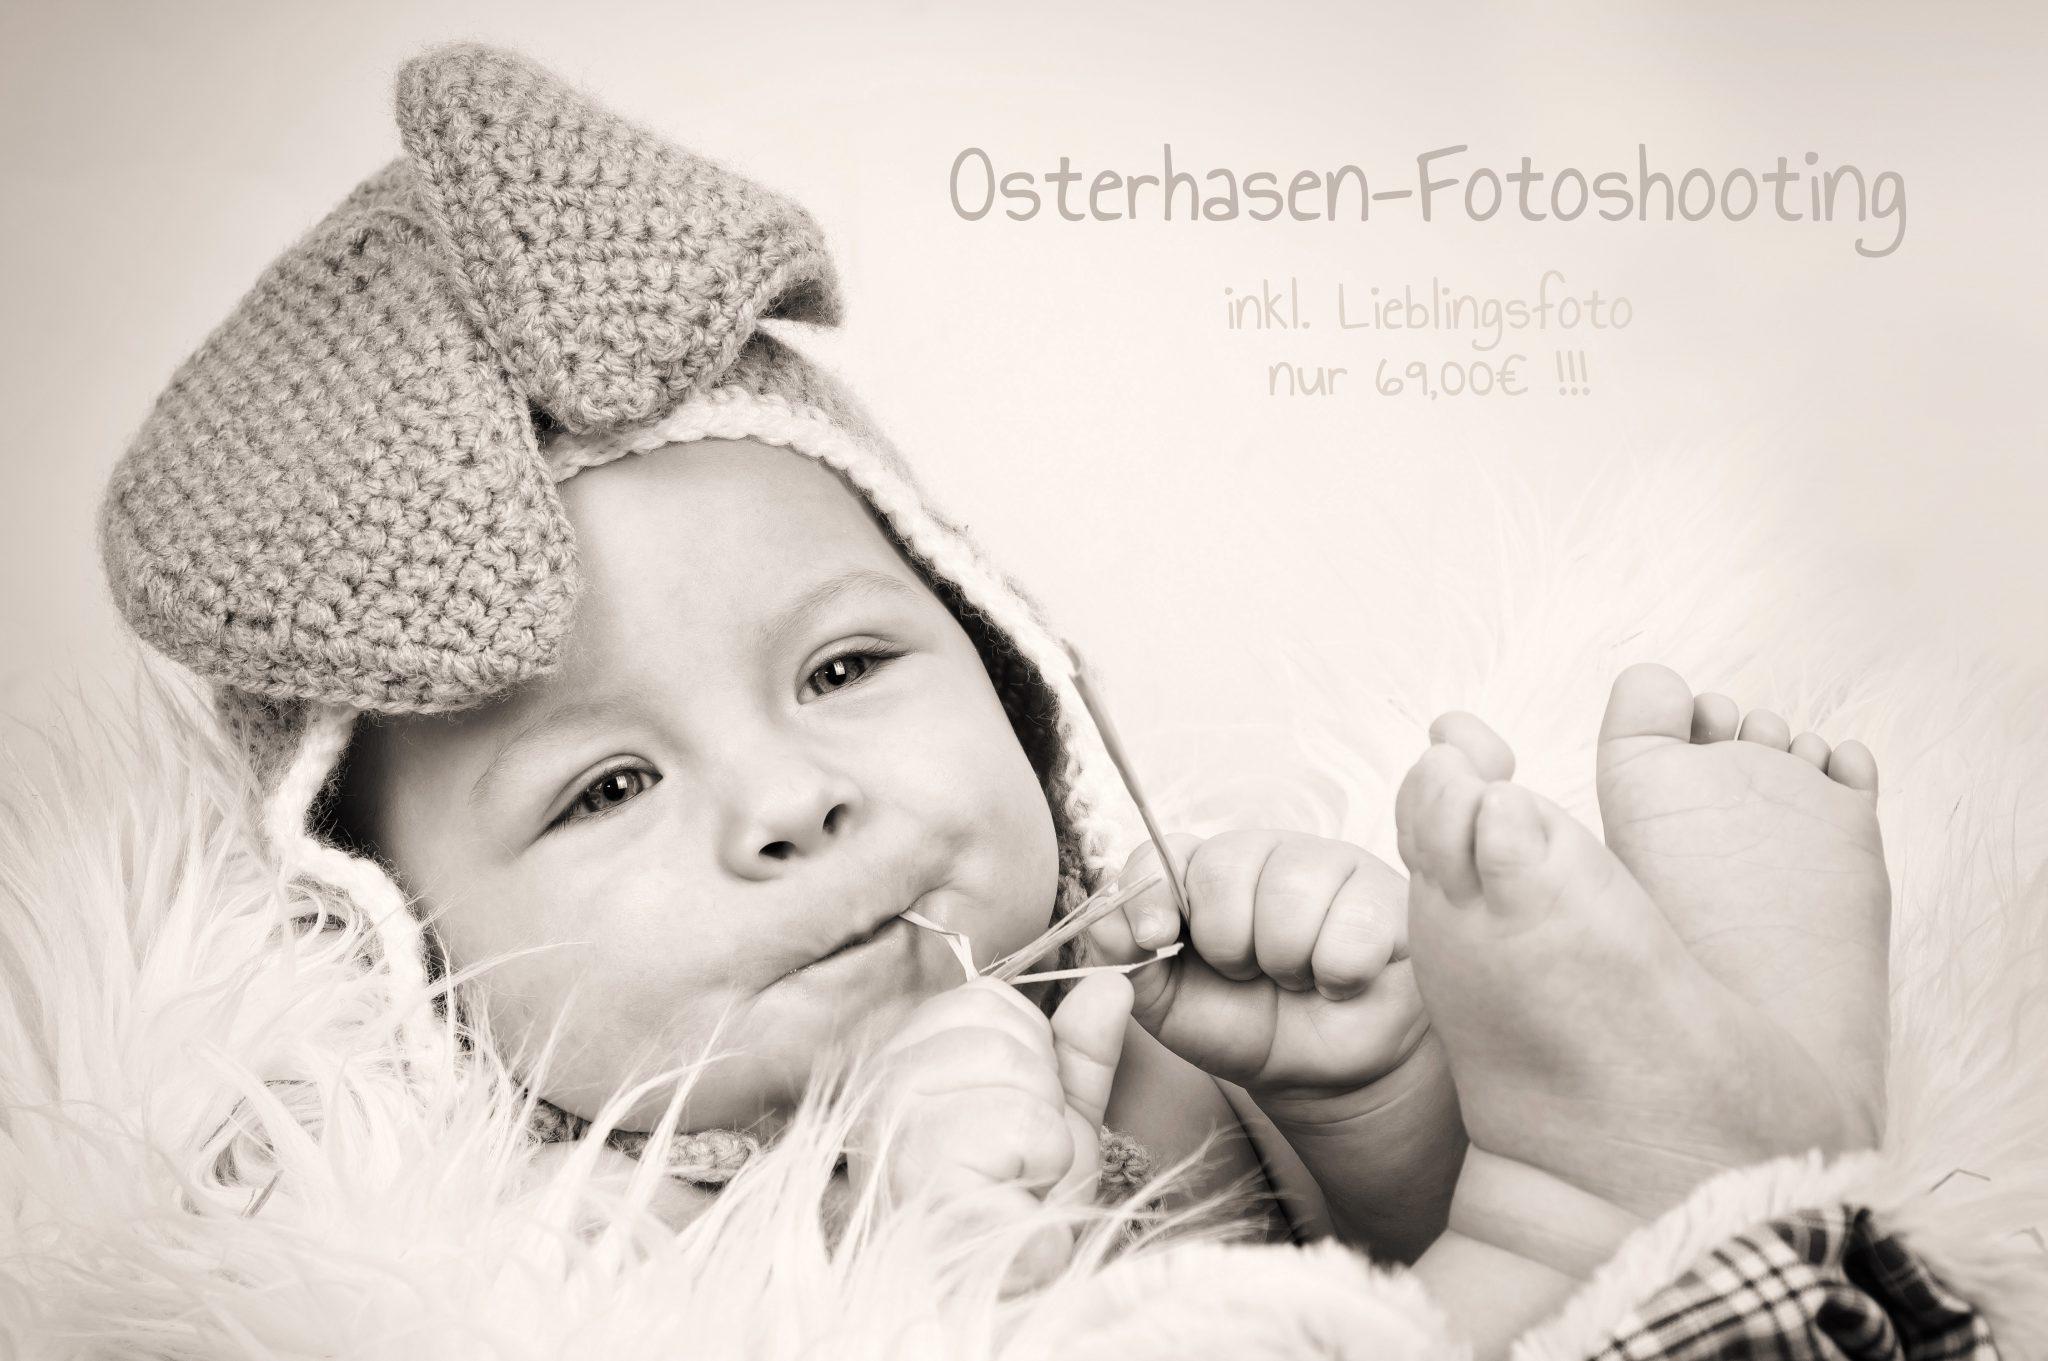 Osterhasenfotoshooting in Rostock